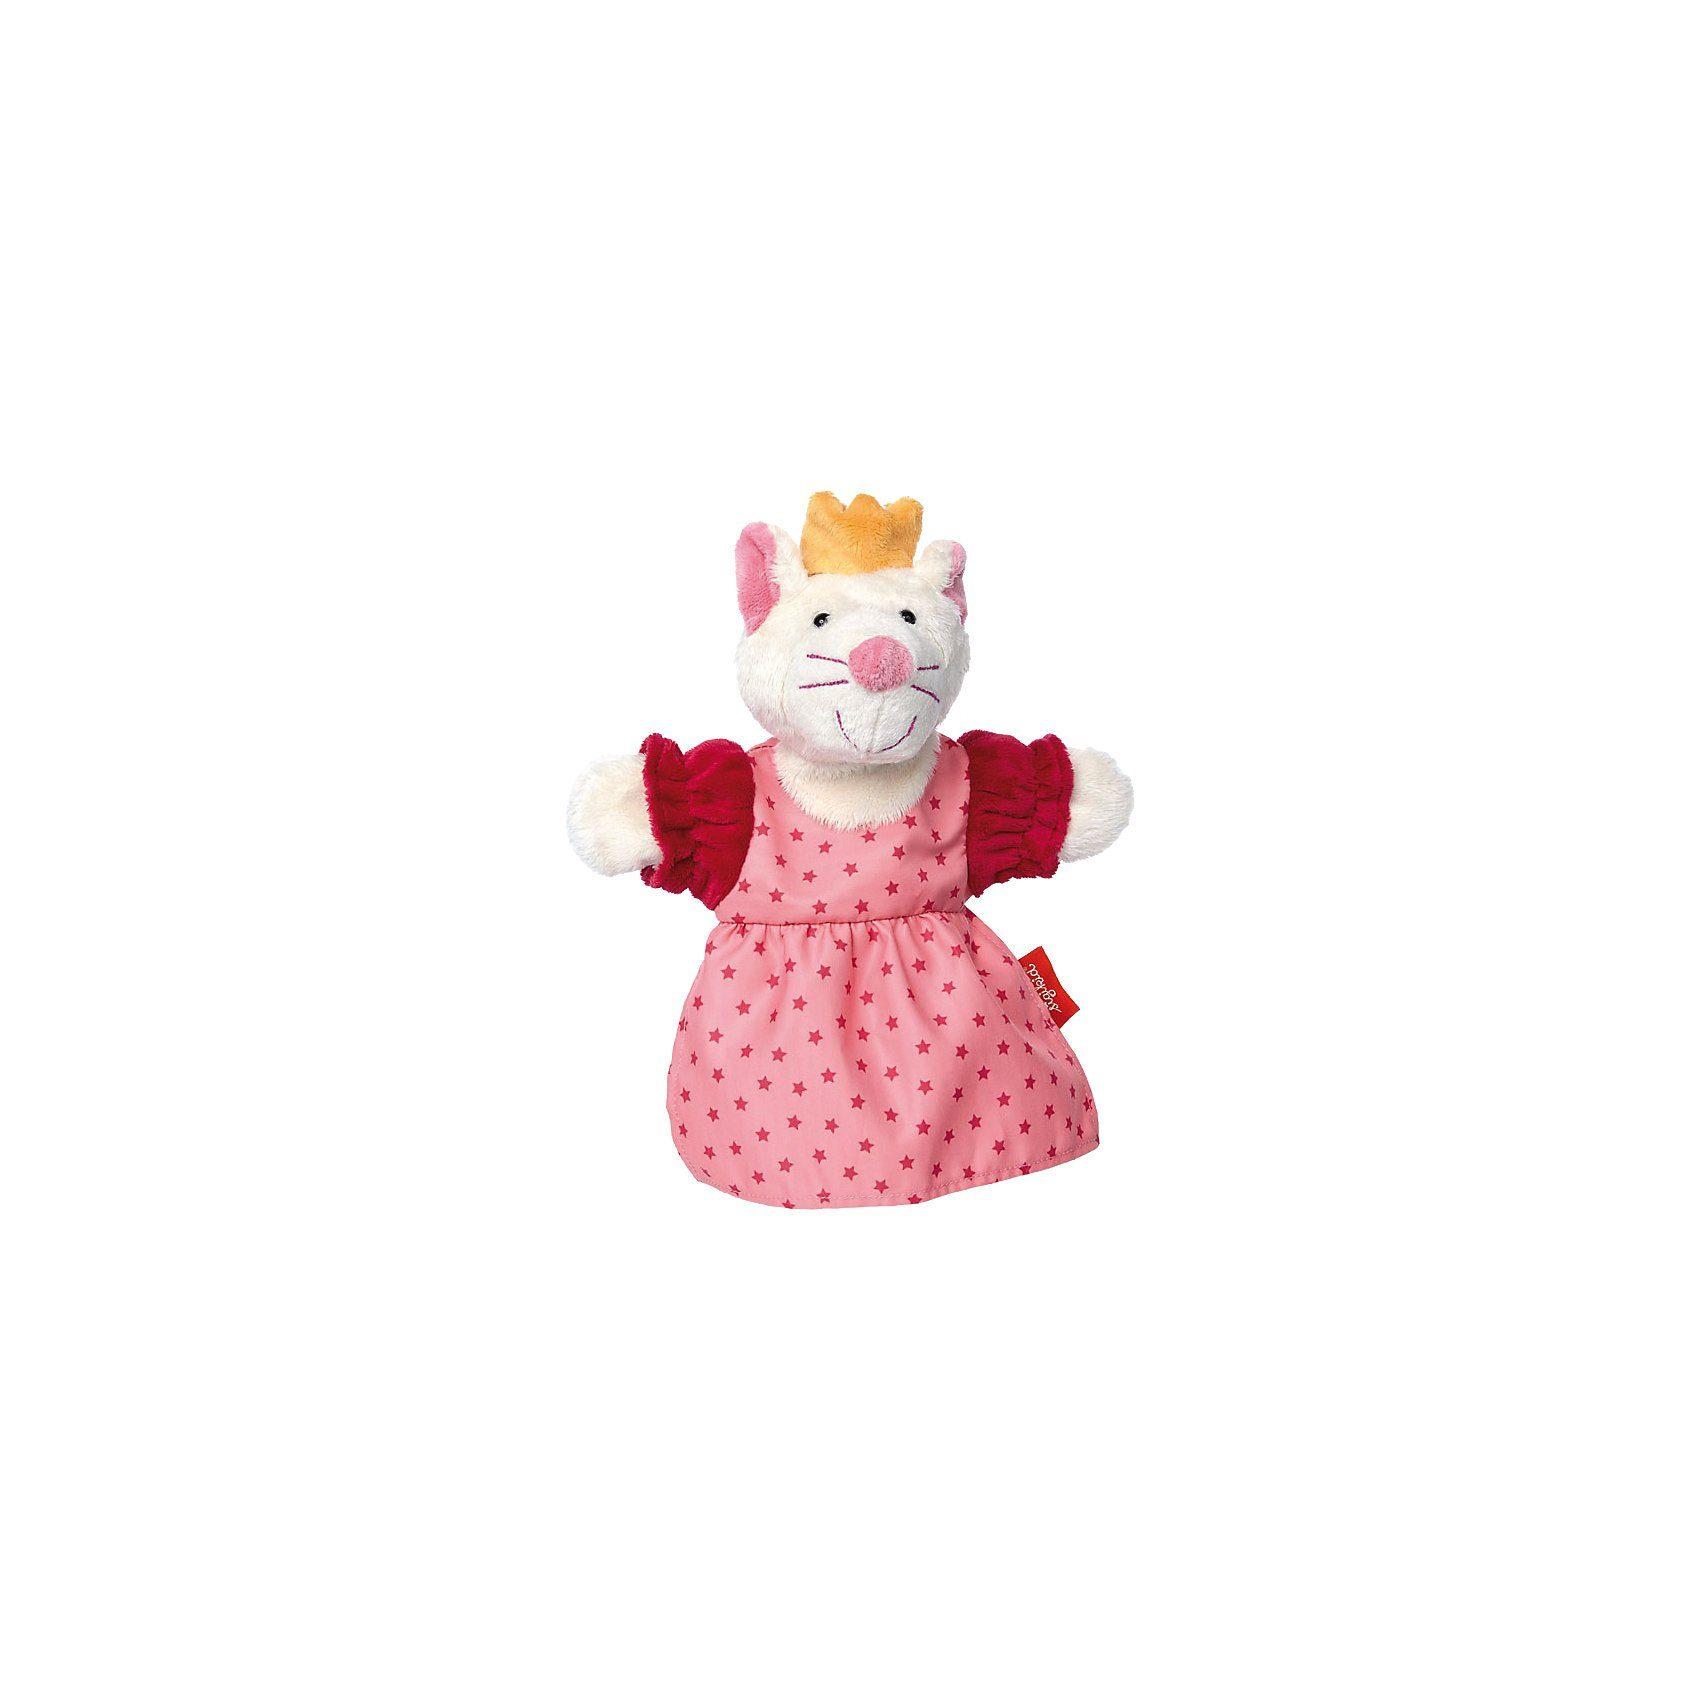 Sigikid Sweety My little theatre Handpuppe Katze, 26 cm (41442)